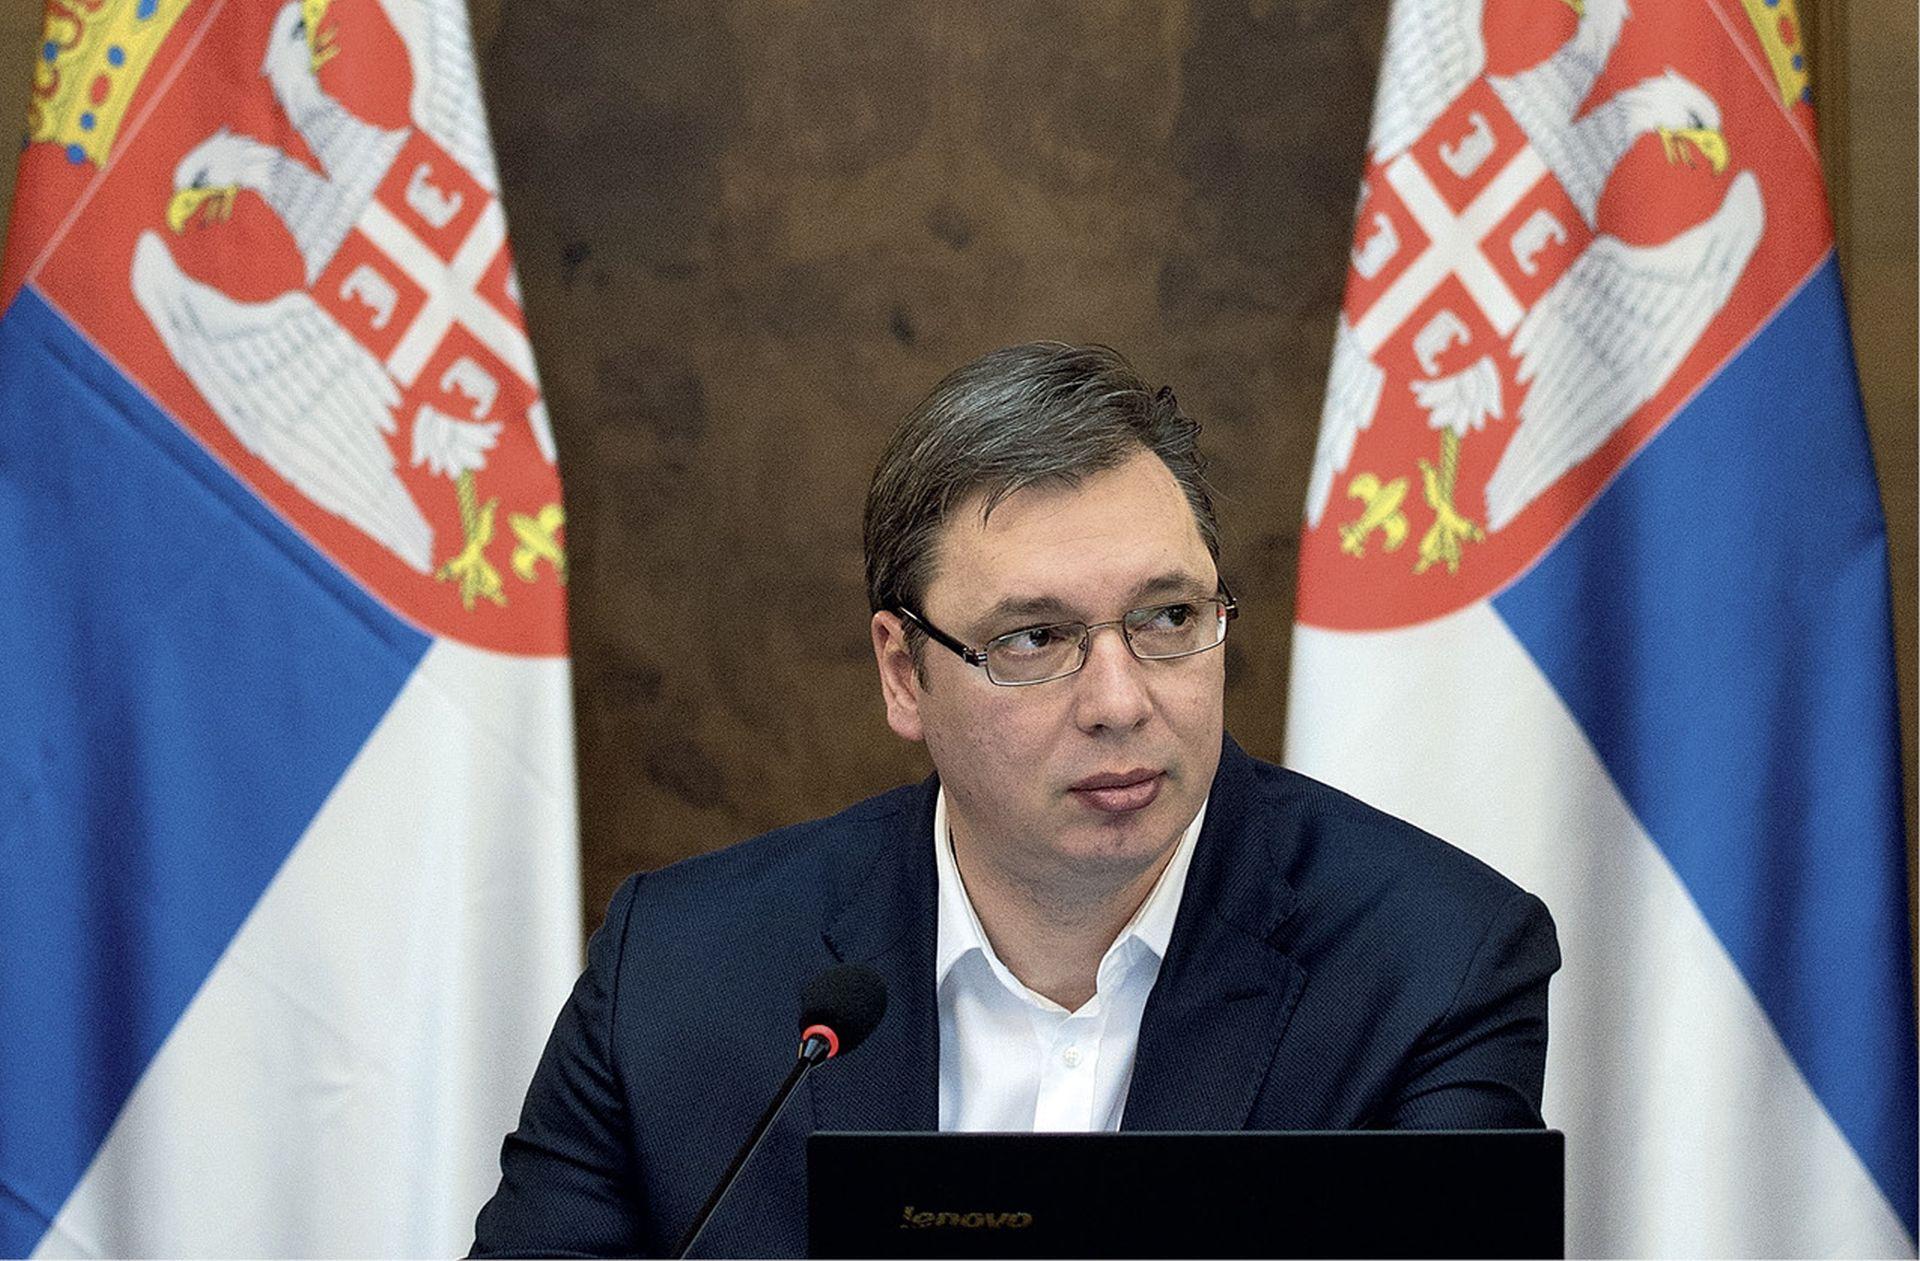 Procvat industrije kamena temeljca donio pobjedu Vučiću